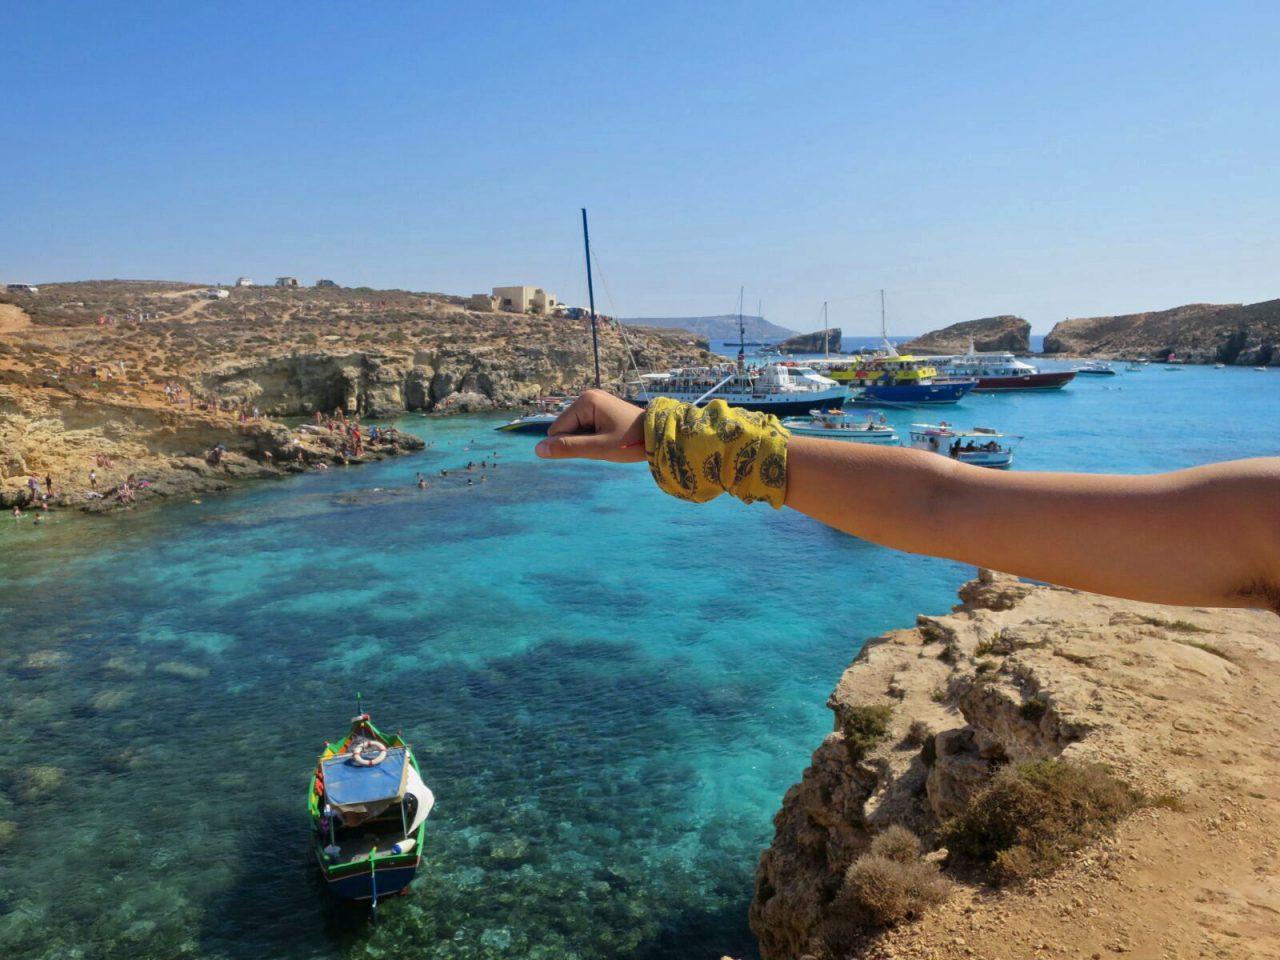 4-Laguna-azul-isla-de-Comino-Malta-1280x960.jpg